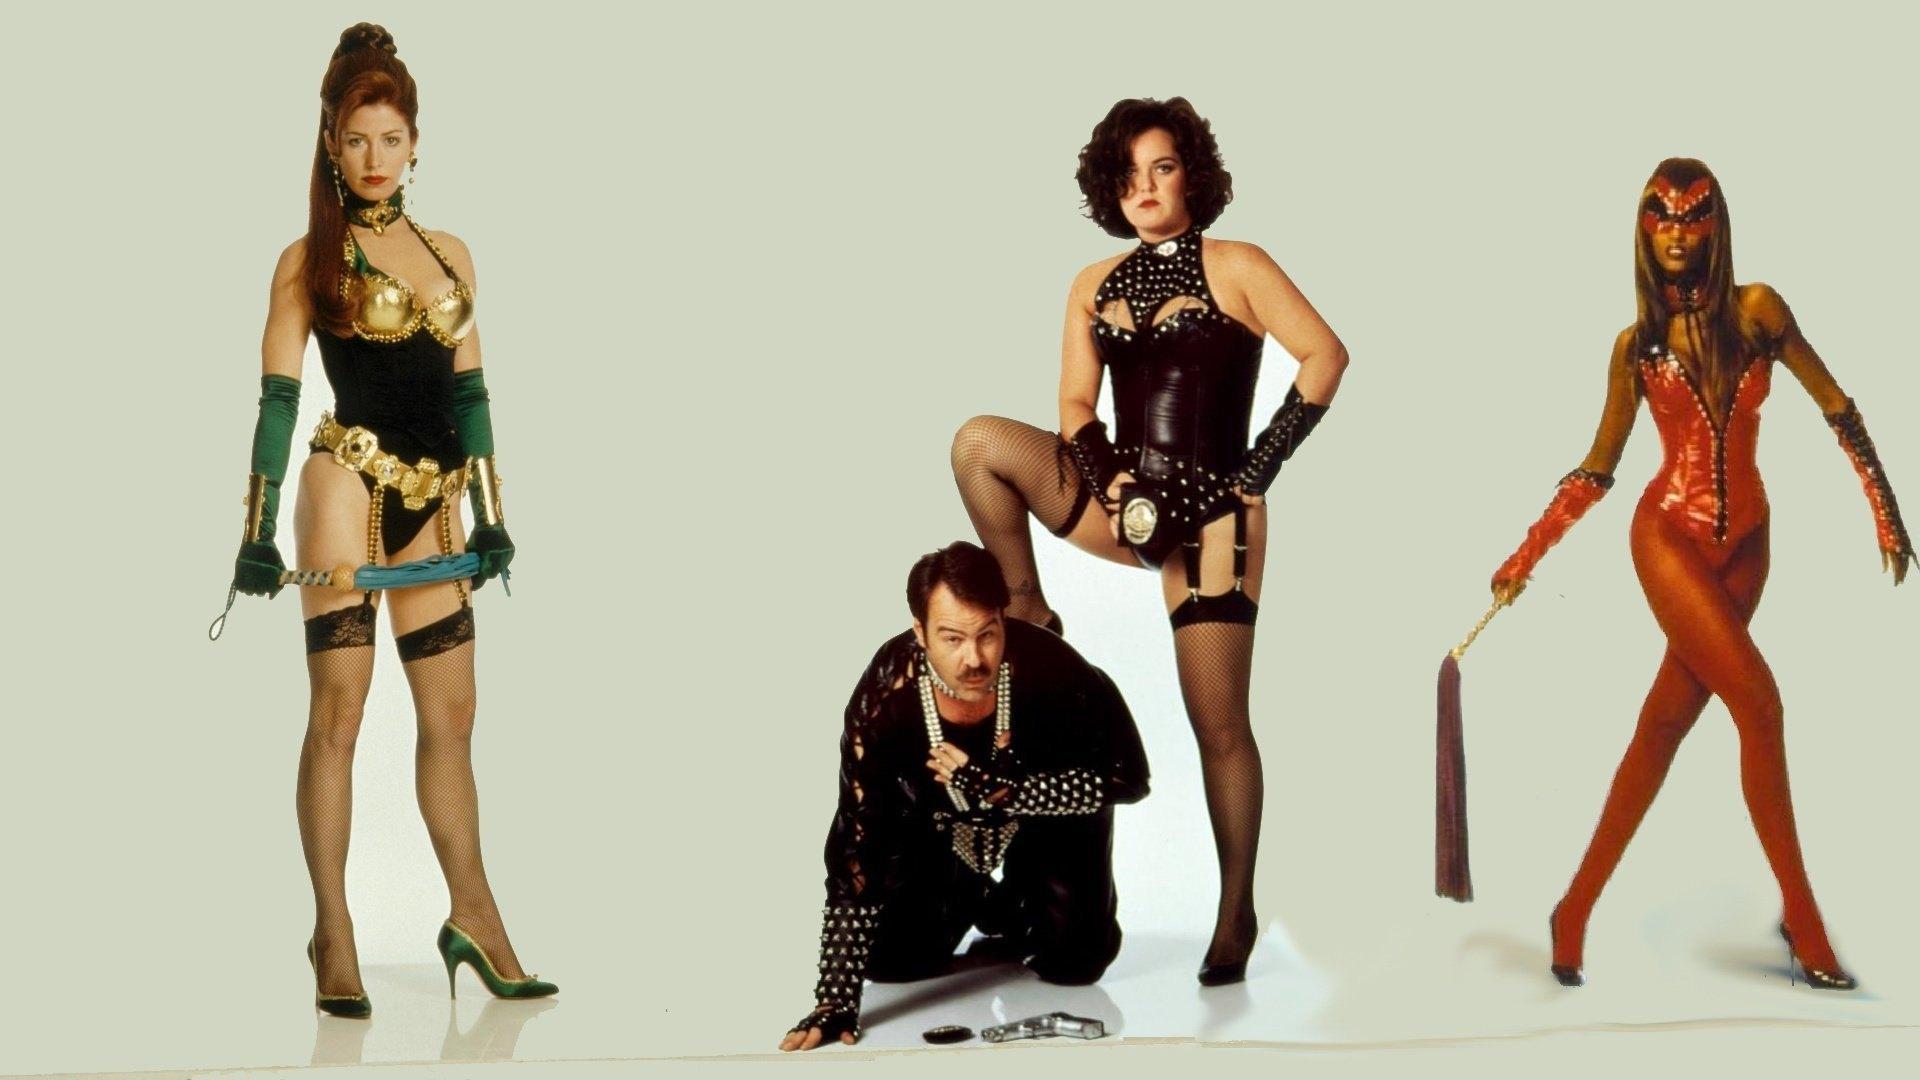 Tinto Brass   Exit To Eden   Райское наслаждение      Full Movie +181994